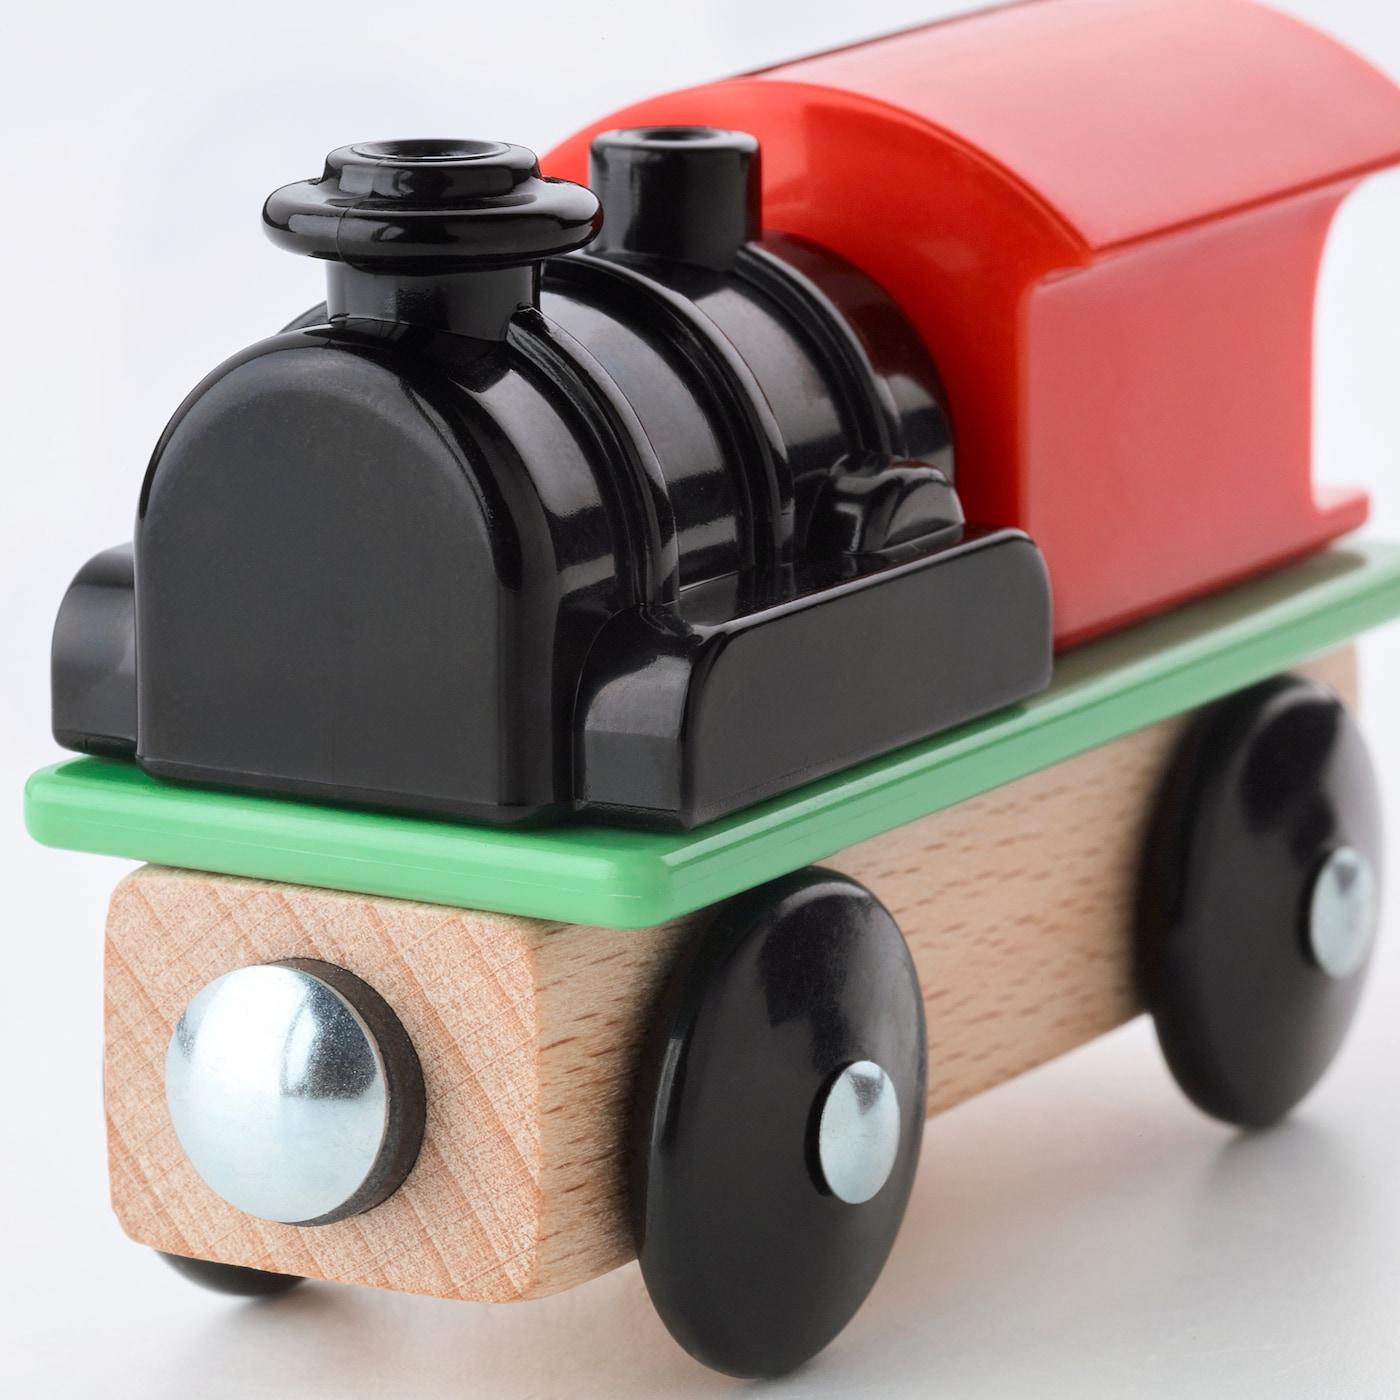 IKEA LILLABO 3-Piece Train Set Free Shipping